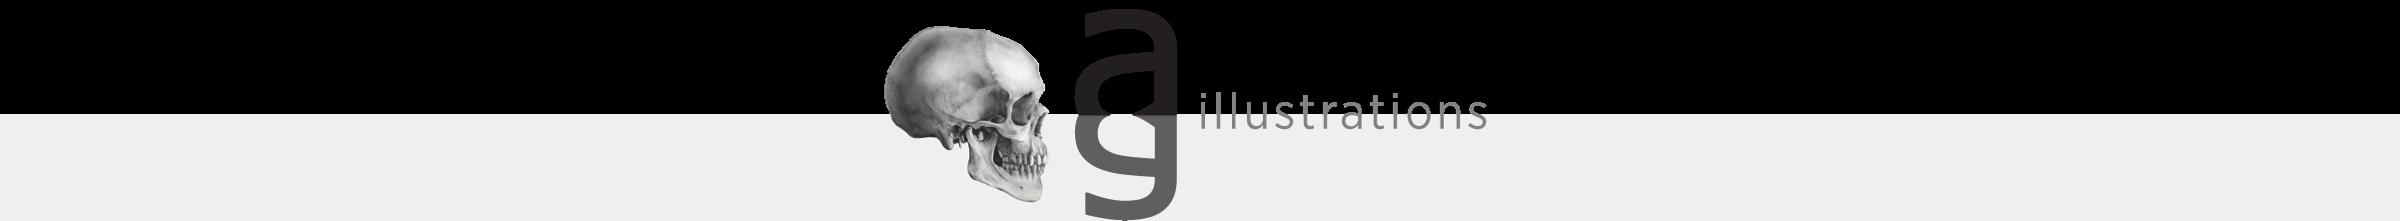 AG Illustrations